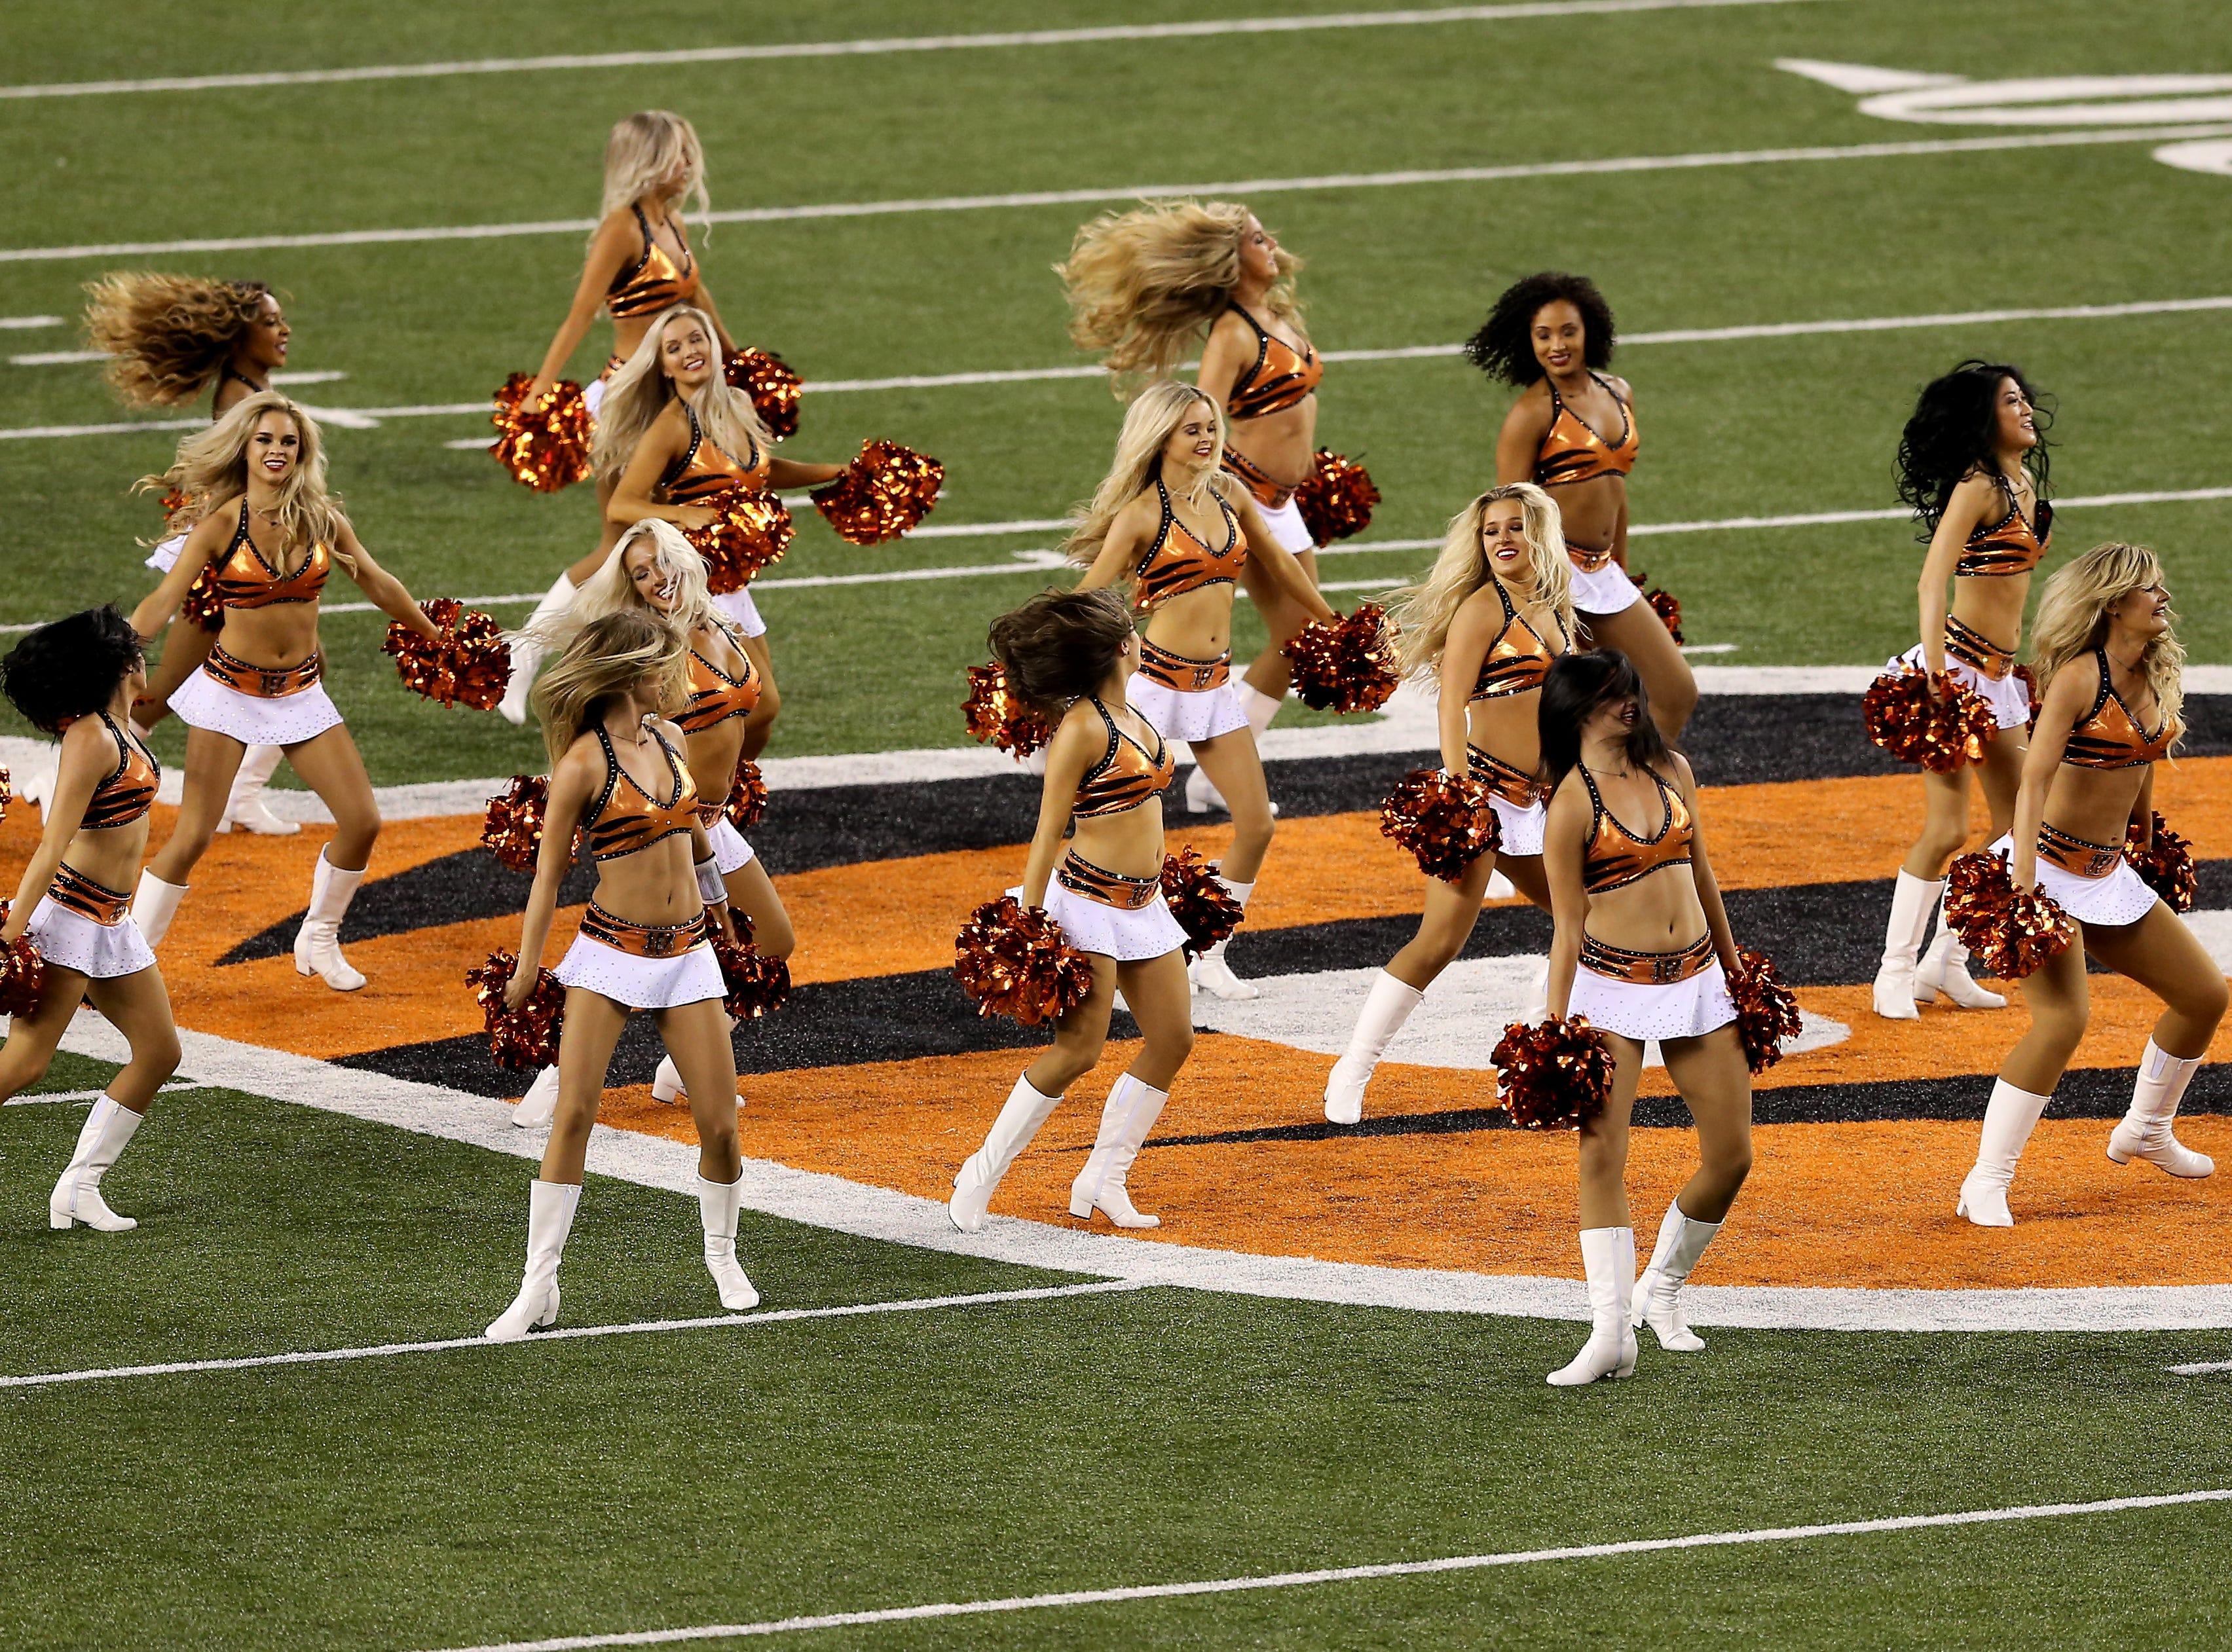 The Cincinnati Ben-Gals perform before the Week 2 NFL football game between the Baltimore Ravens and the Cincinnati Bengals, Thursday, Sept. 13, 2018, Paul Brown Stadium in Cincinnati.